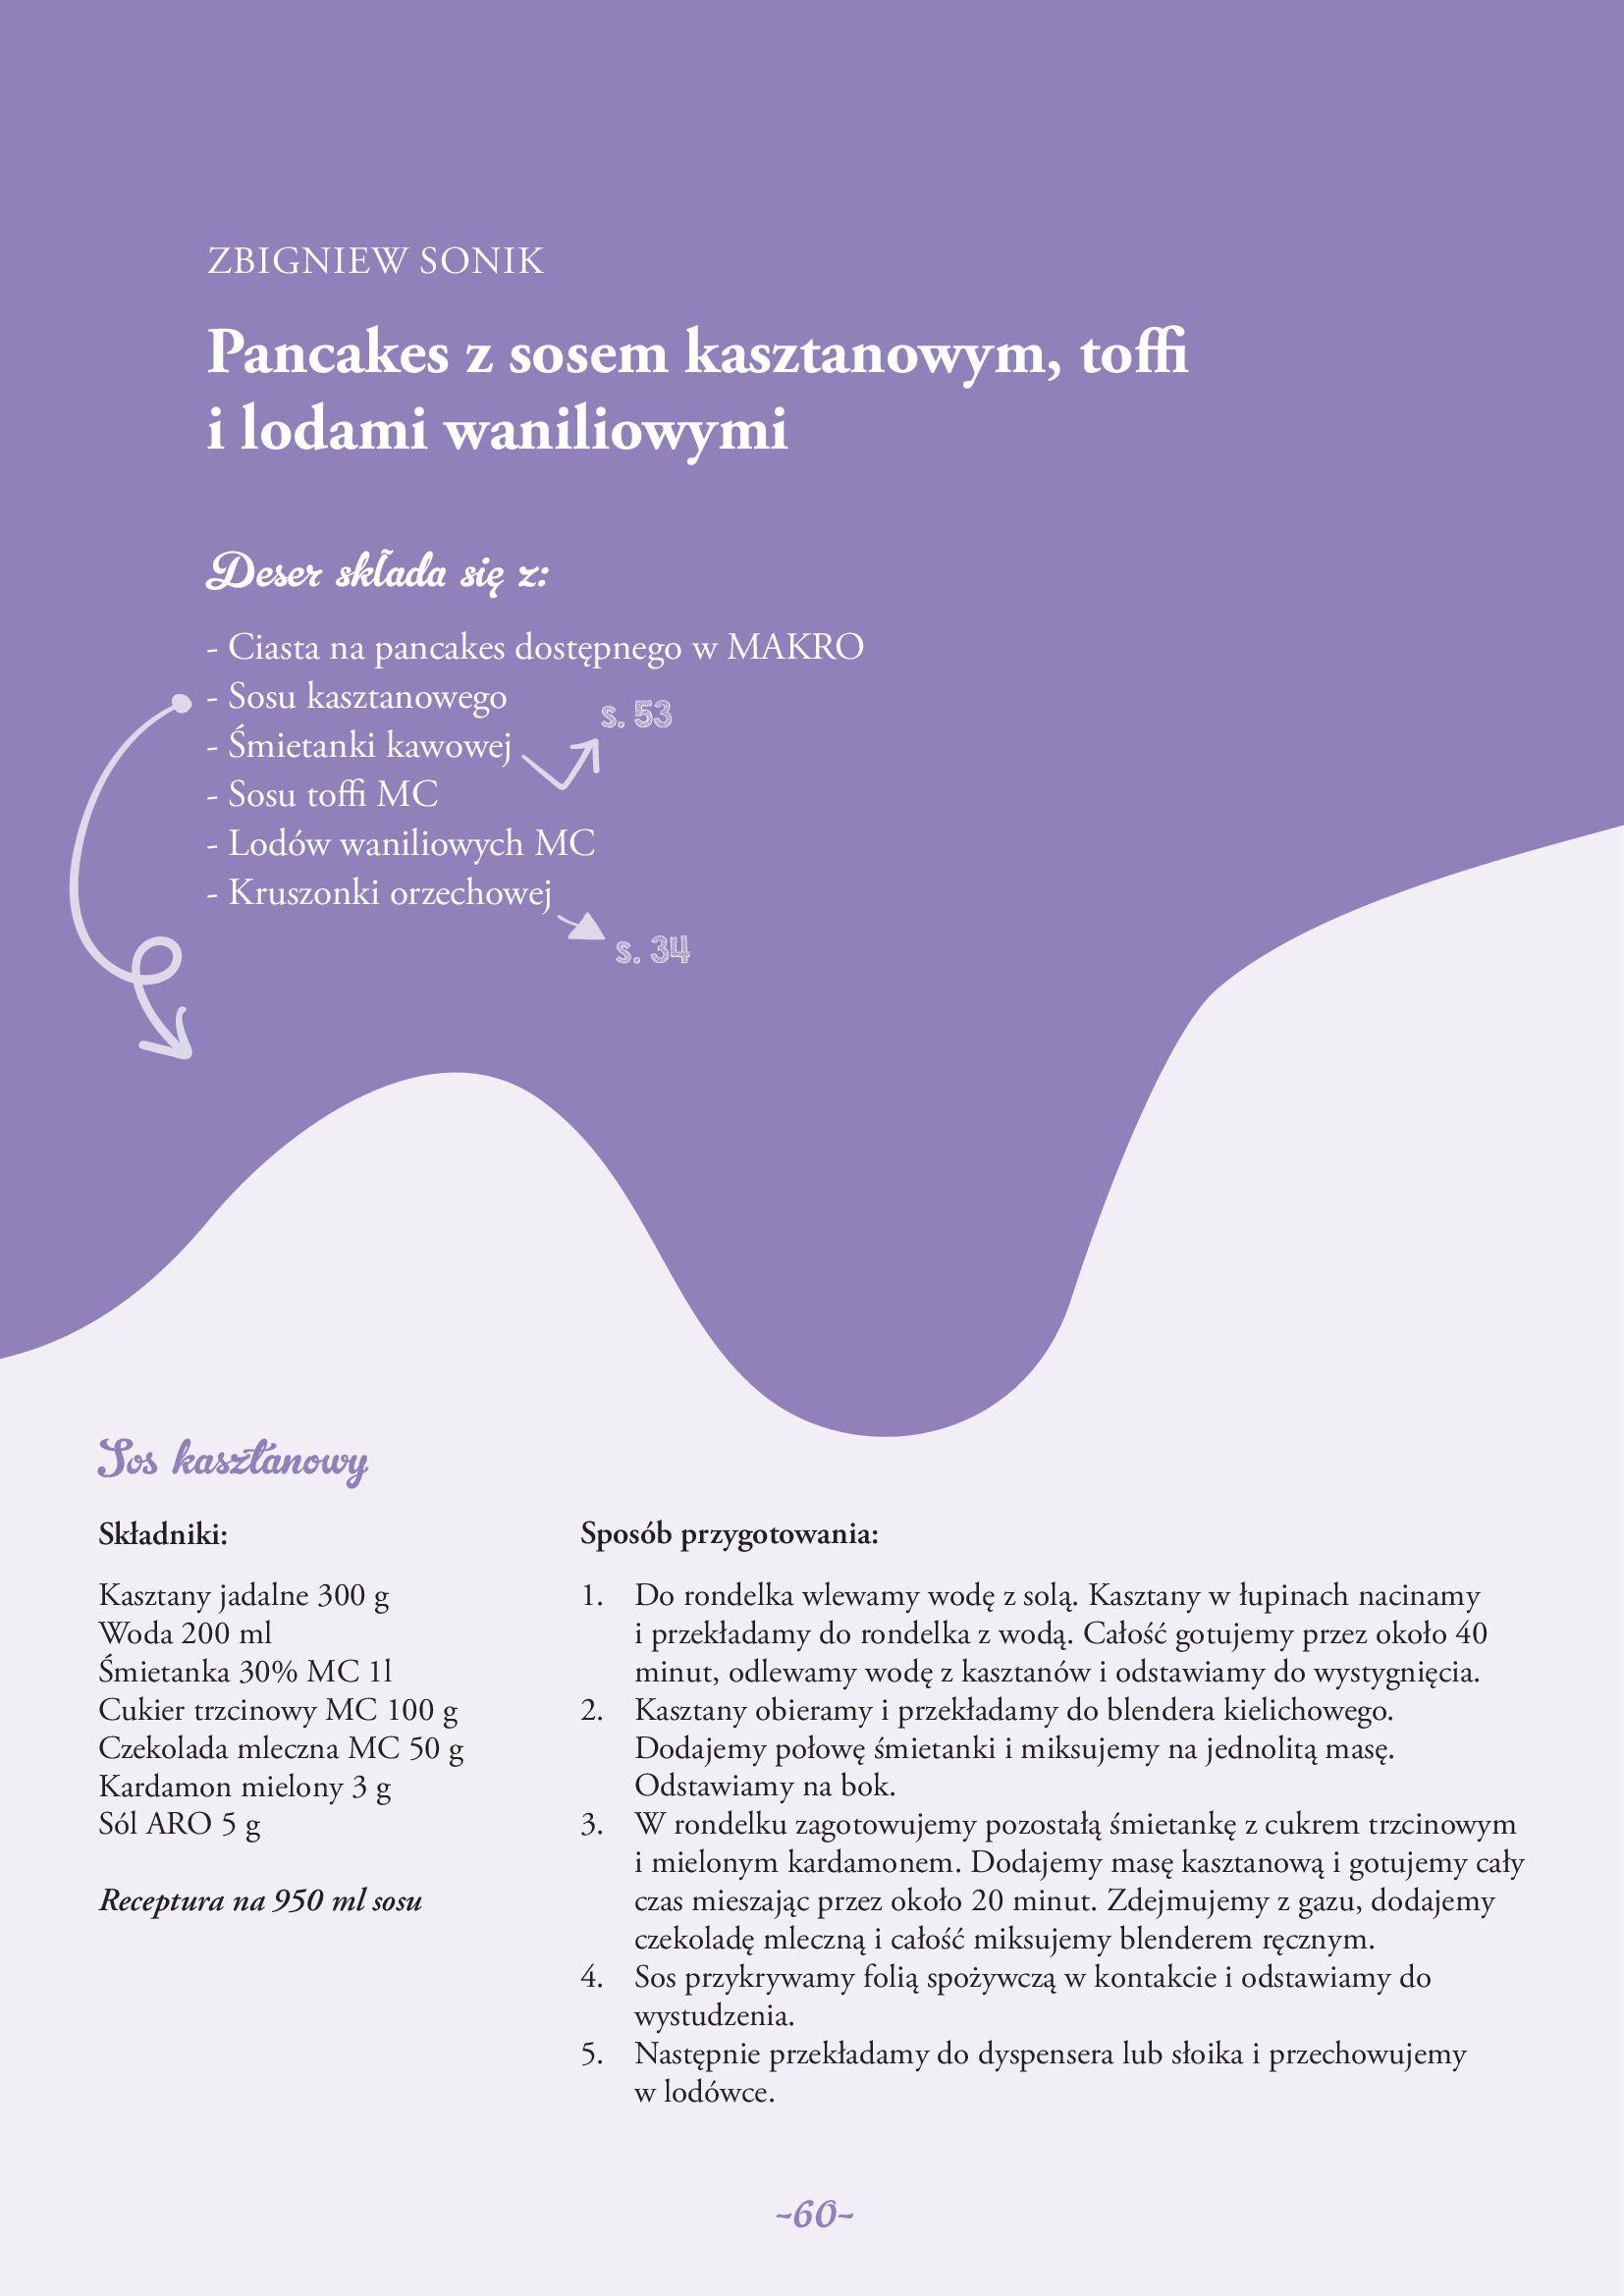 Gazetka Makro: Gazetka Makro - lody i desery 2021-05-21 page-60